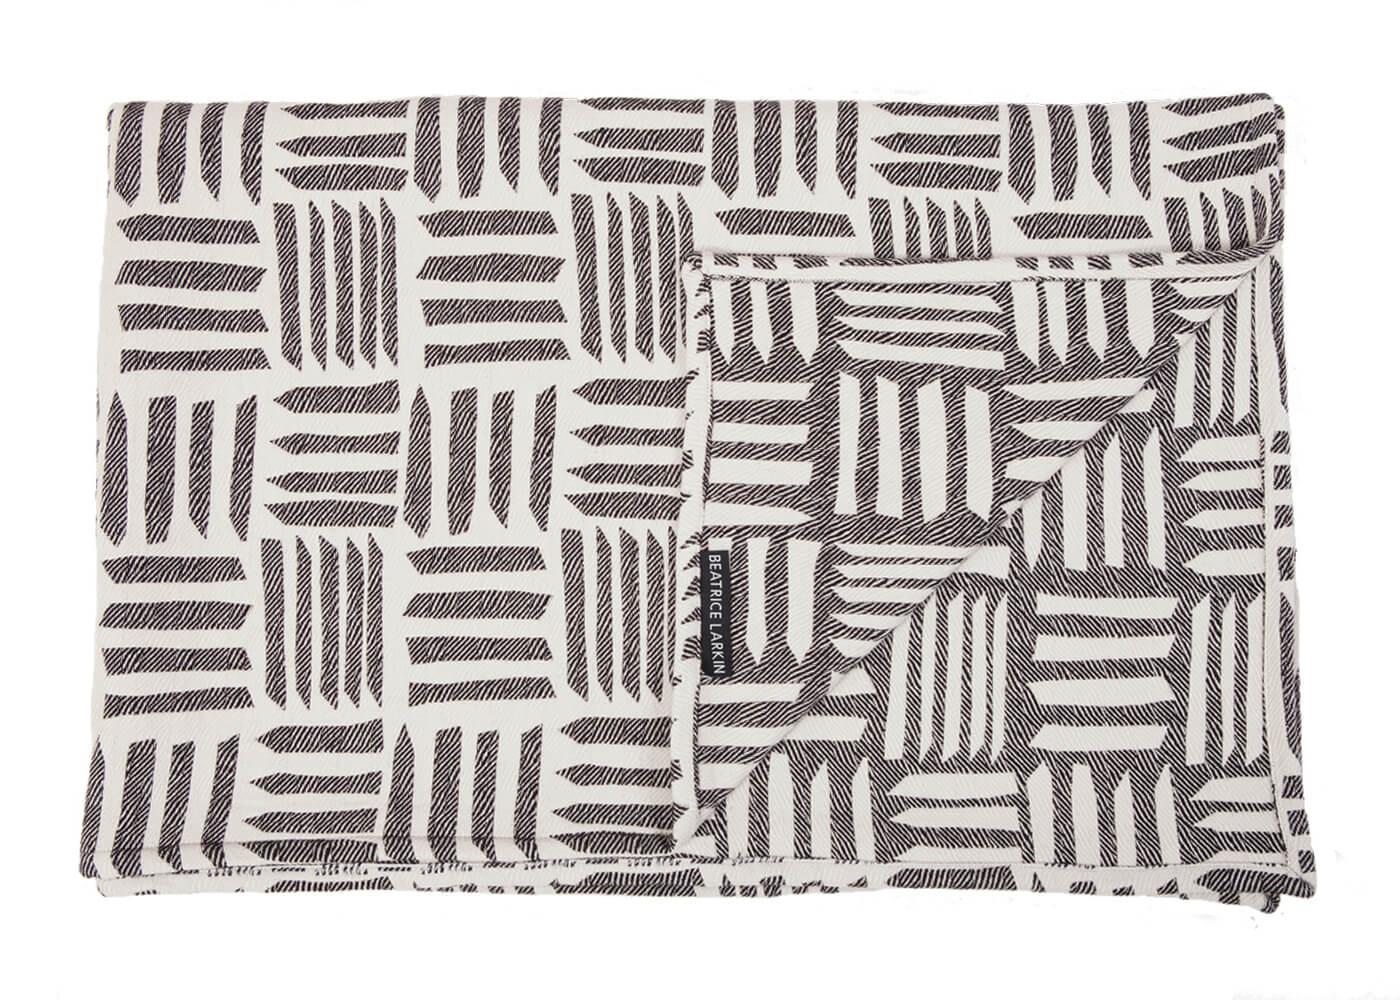 Beatrice Larkin Cut Throw, Merino Wool Blanket